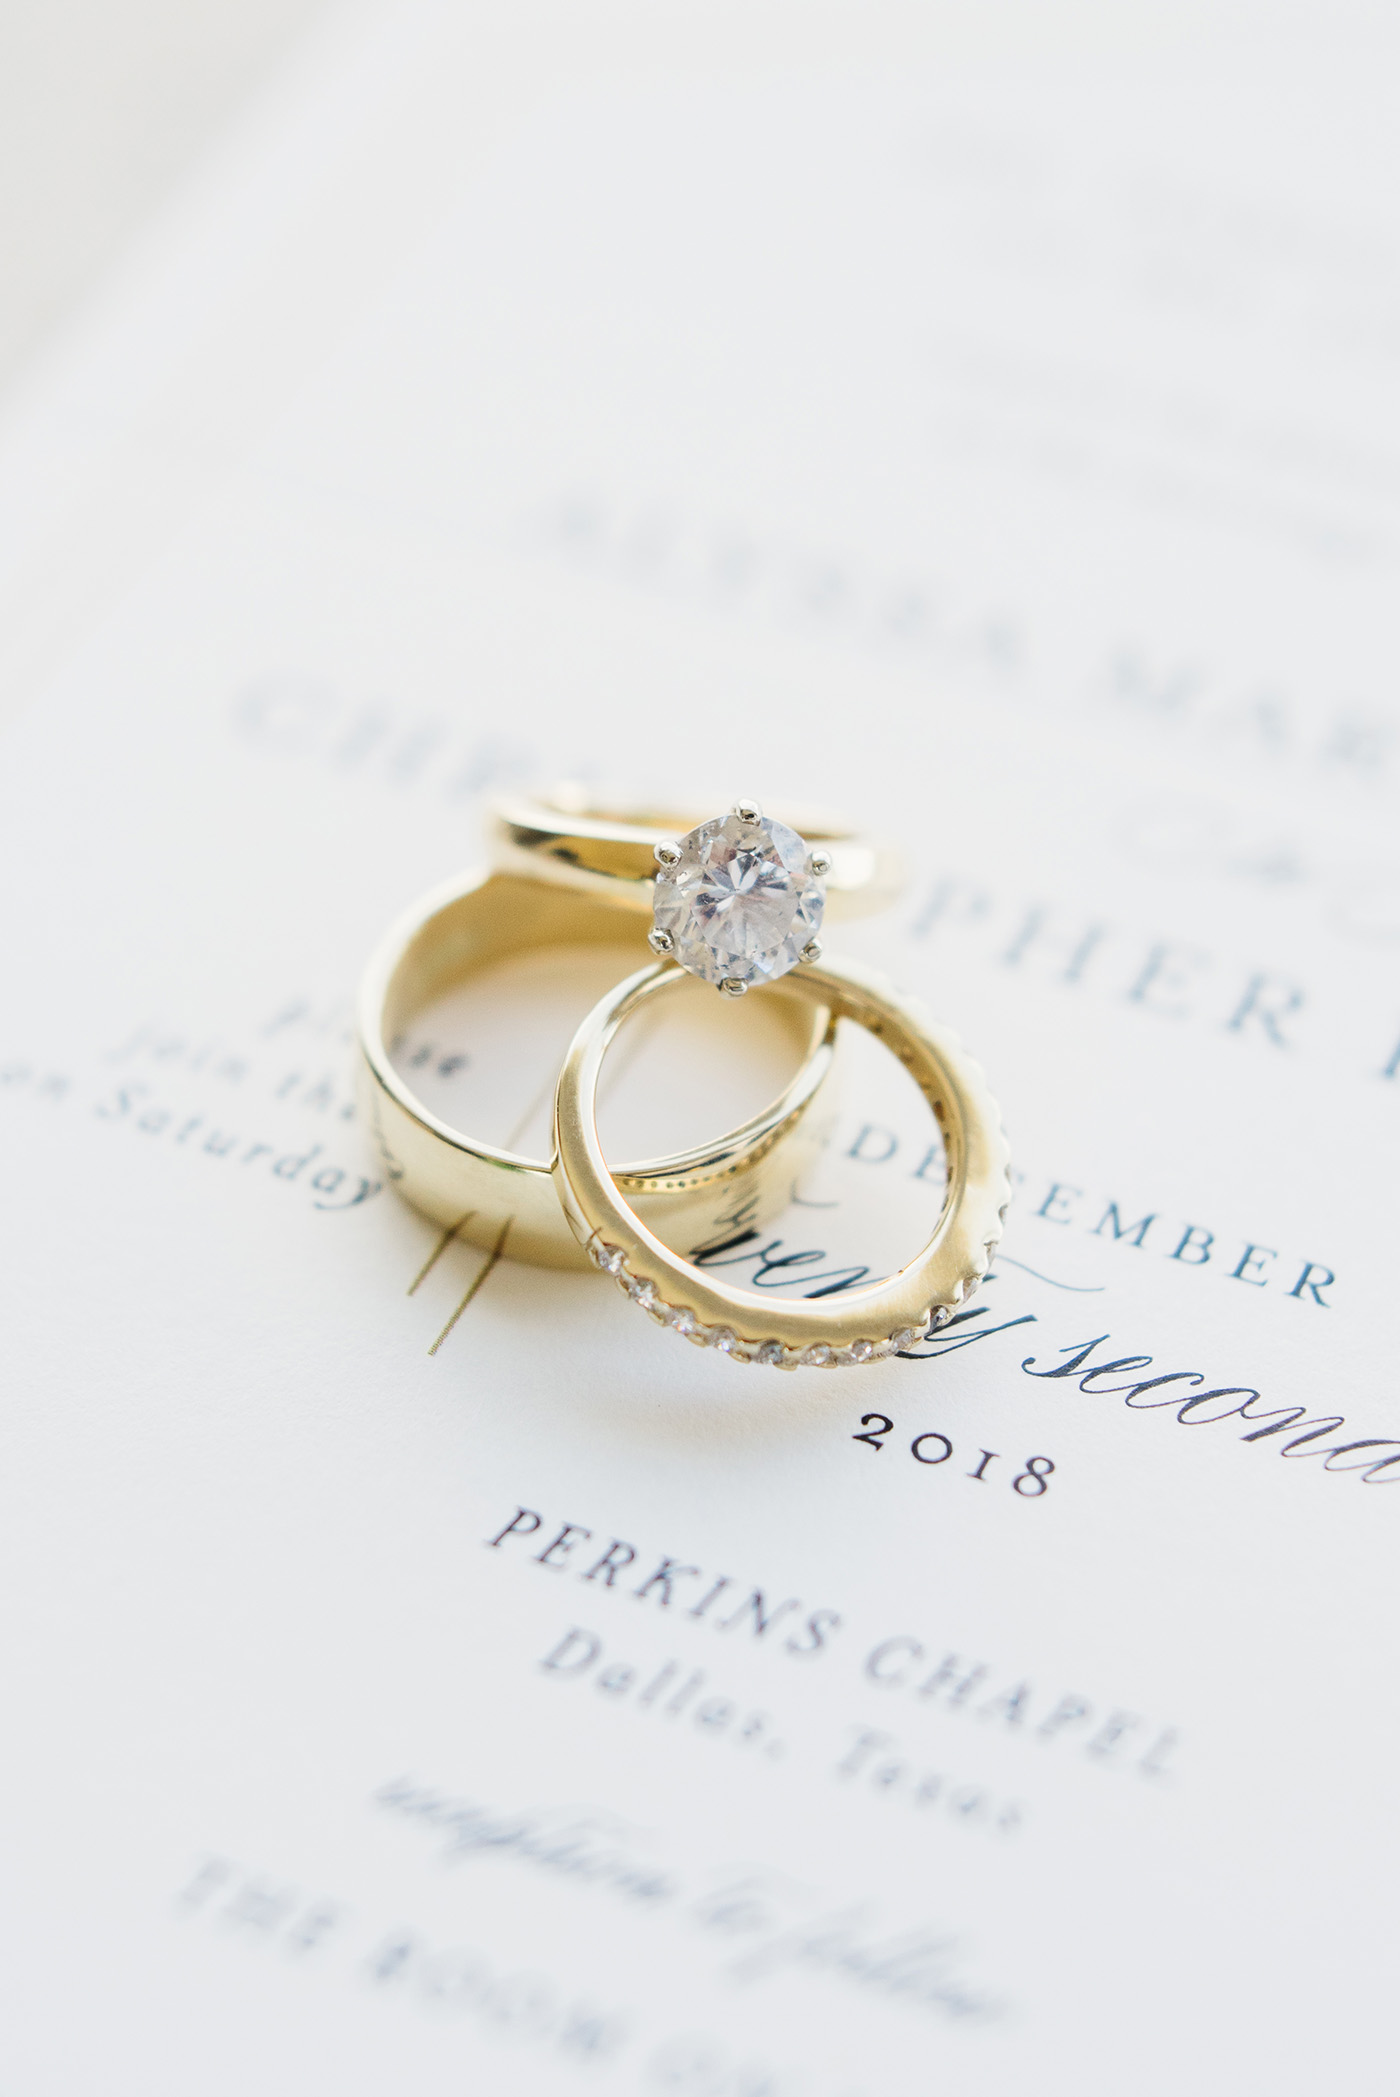 Dallas Wedding Planner - Winter Wedding at The Room on Main - Allday Events - 6.jpg